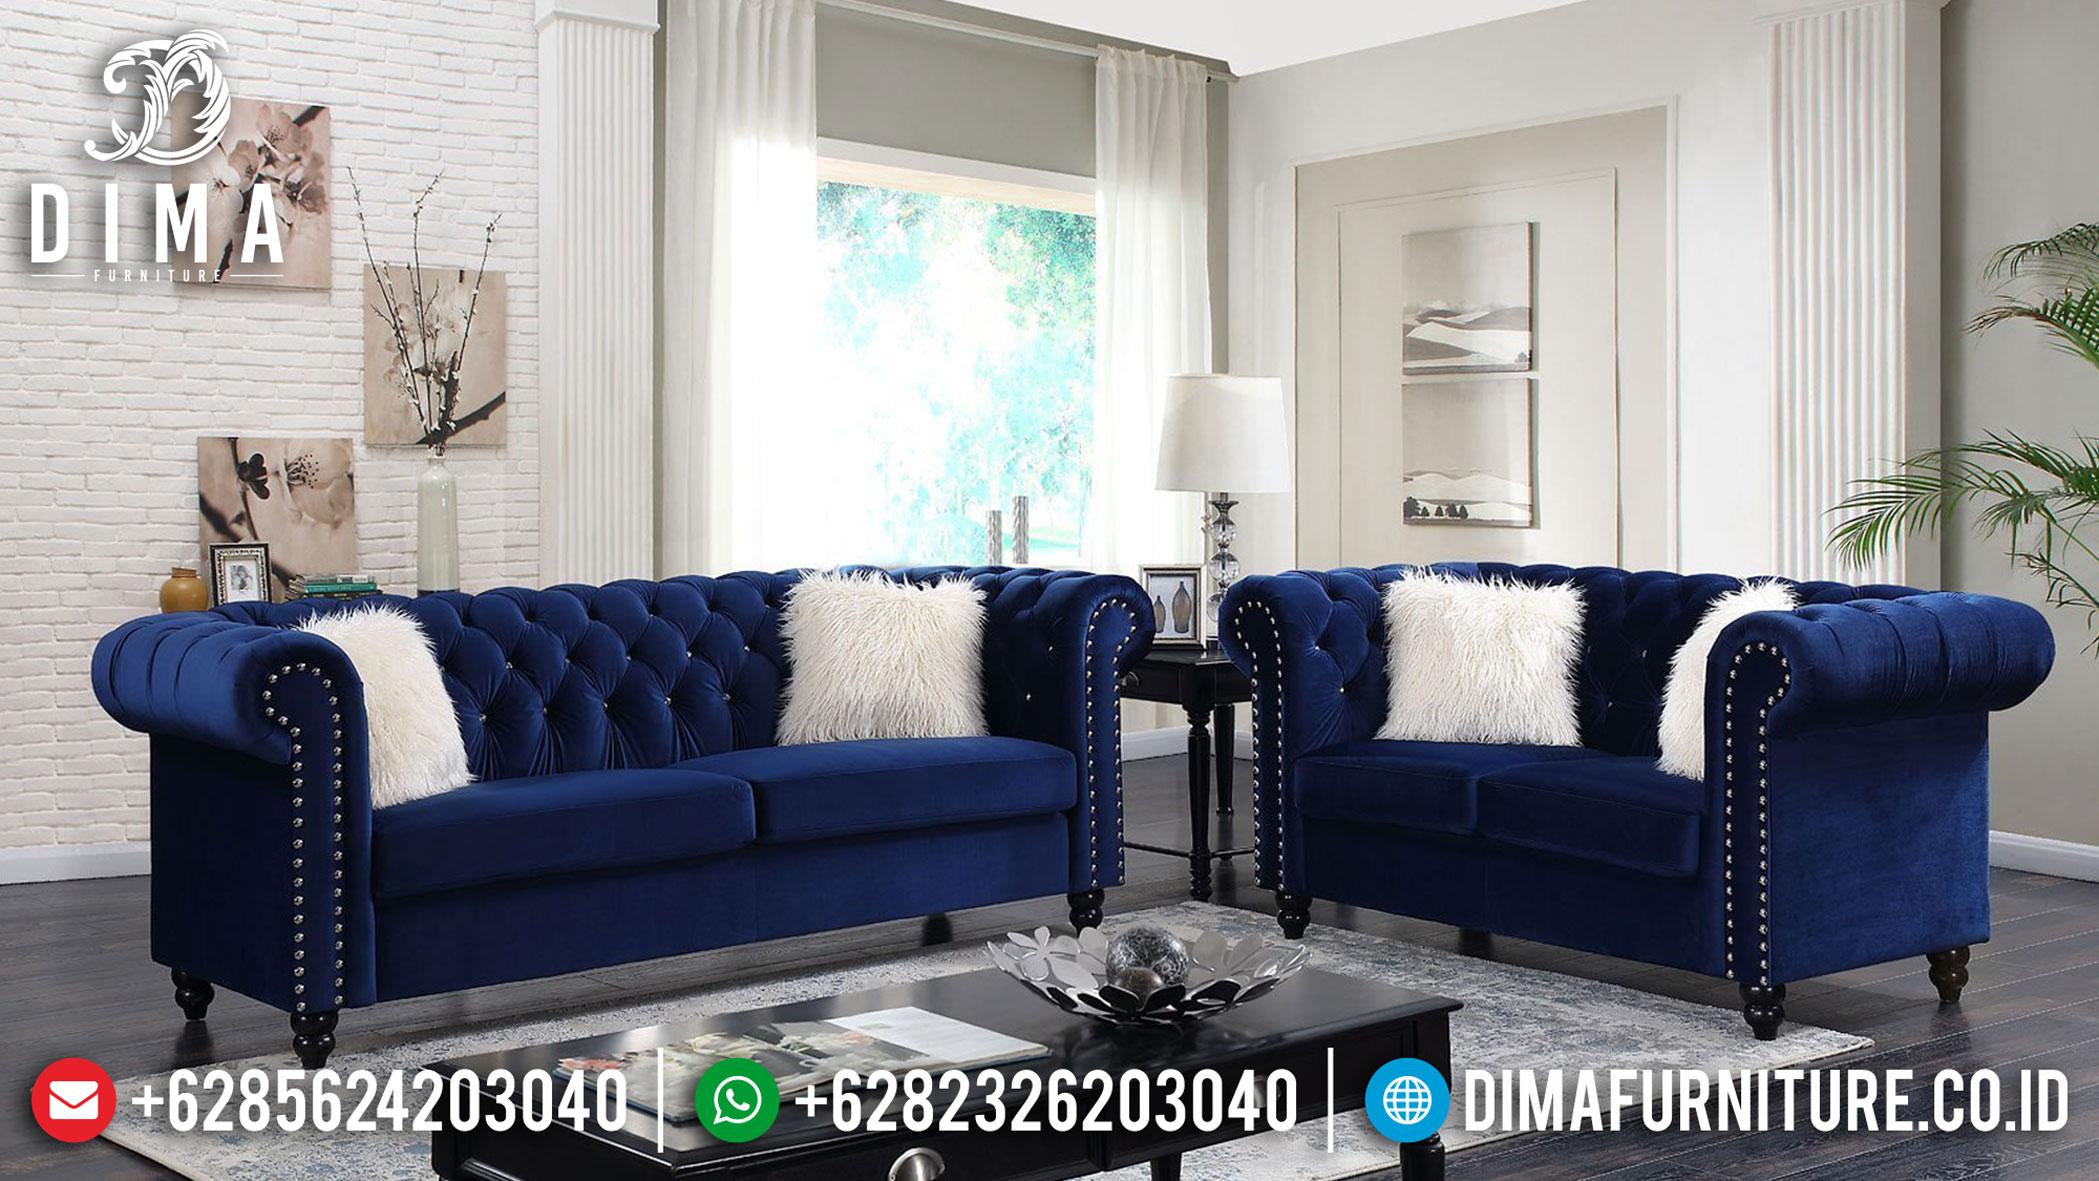 Sale Sofa Tamu Chesterfield Minimalis Free Ongkir Jawa Bali Best Price MMJ-0930